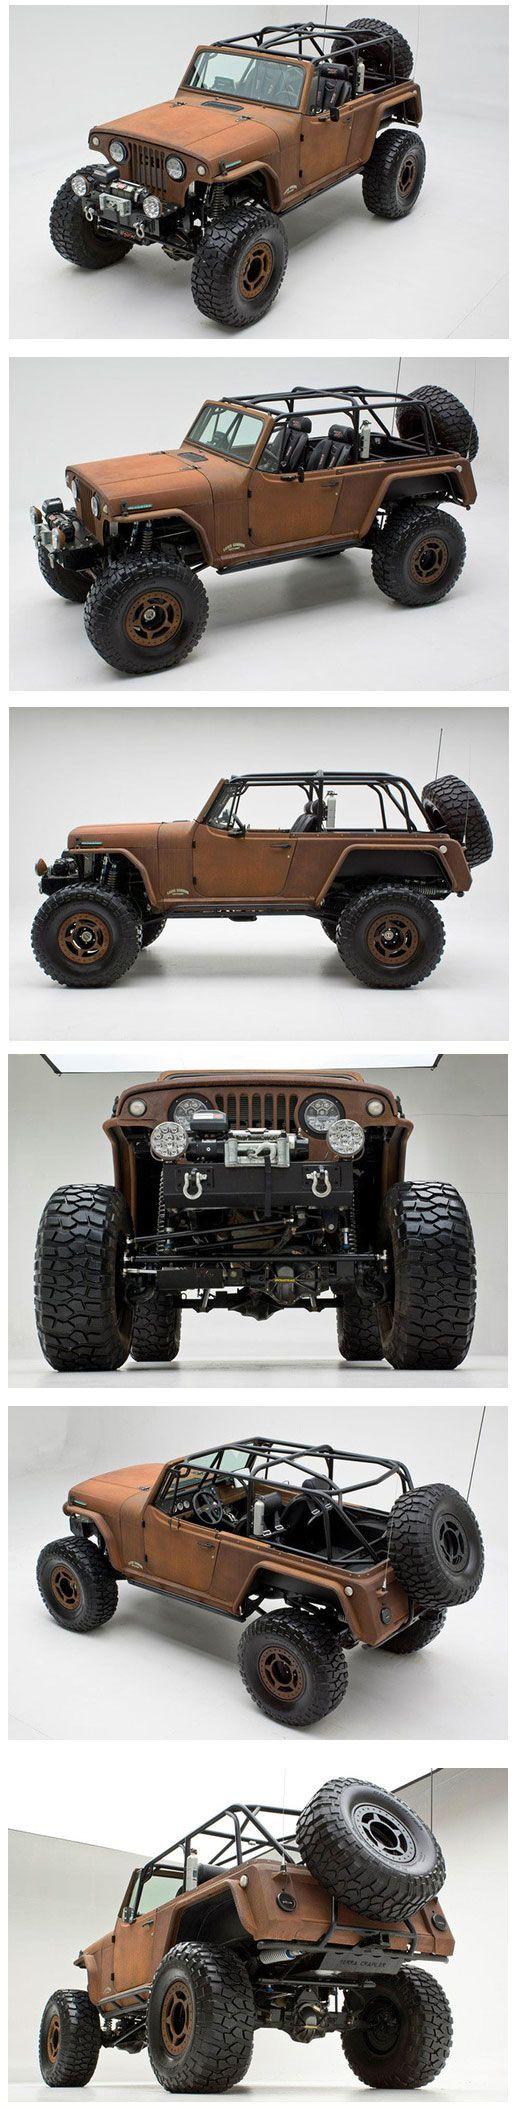 Rusted Terra Crawler. 1969 Jeepster Commando